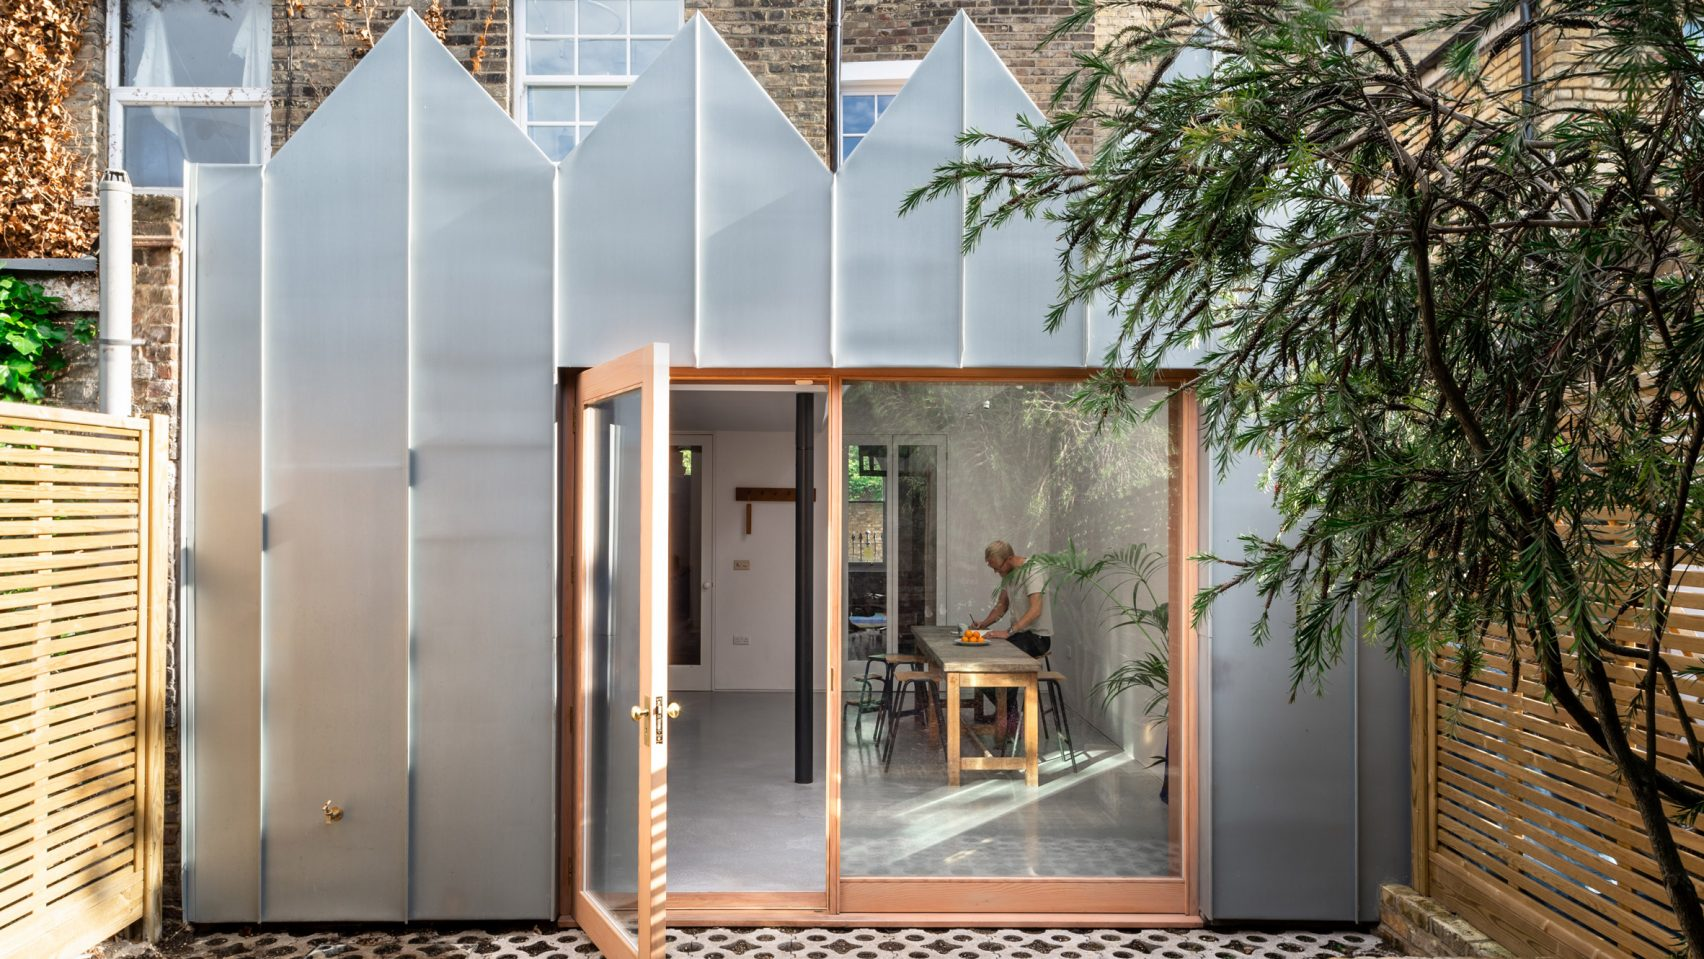 zigzag zinc facade of kitchen extension